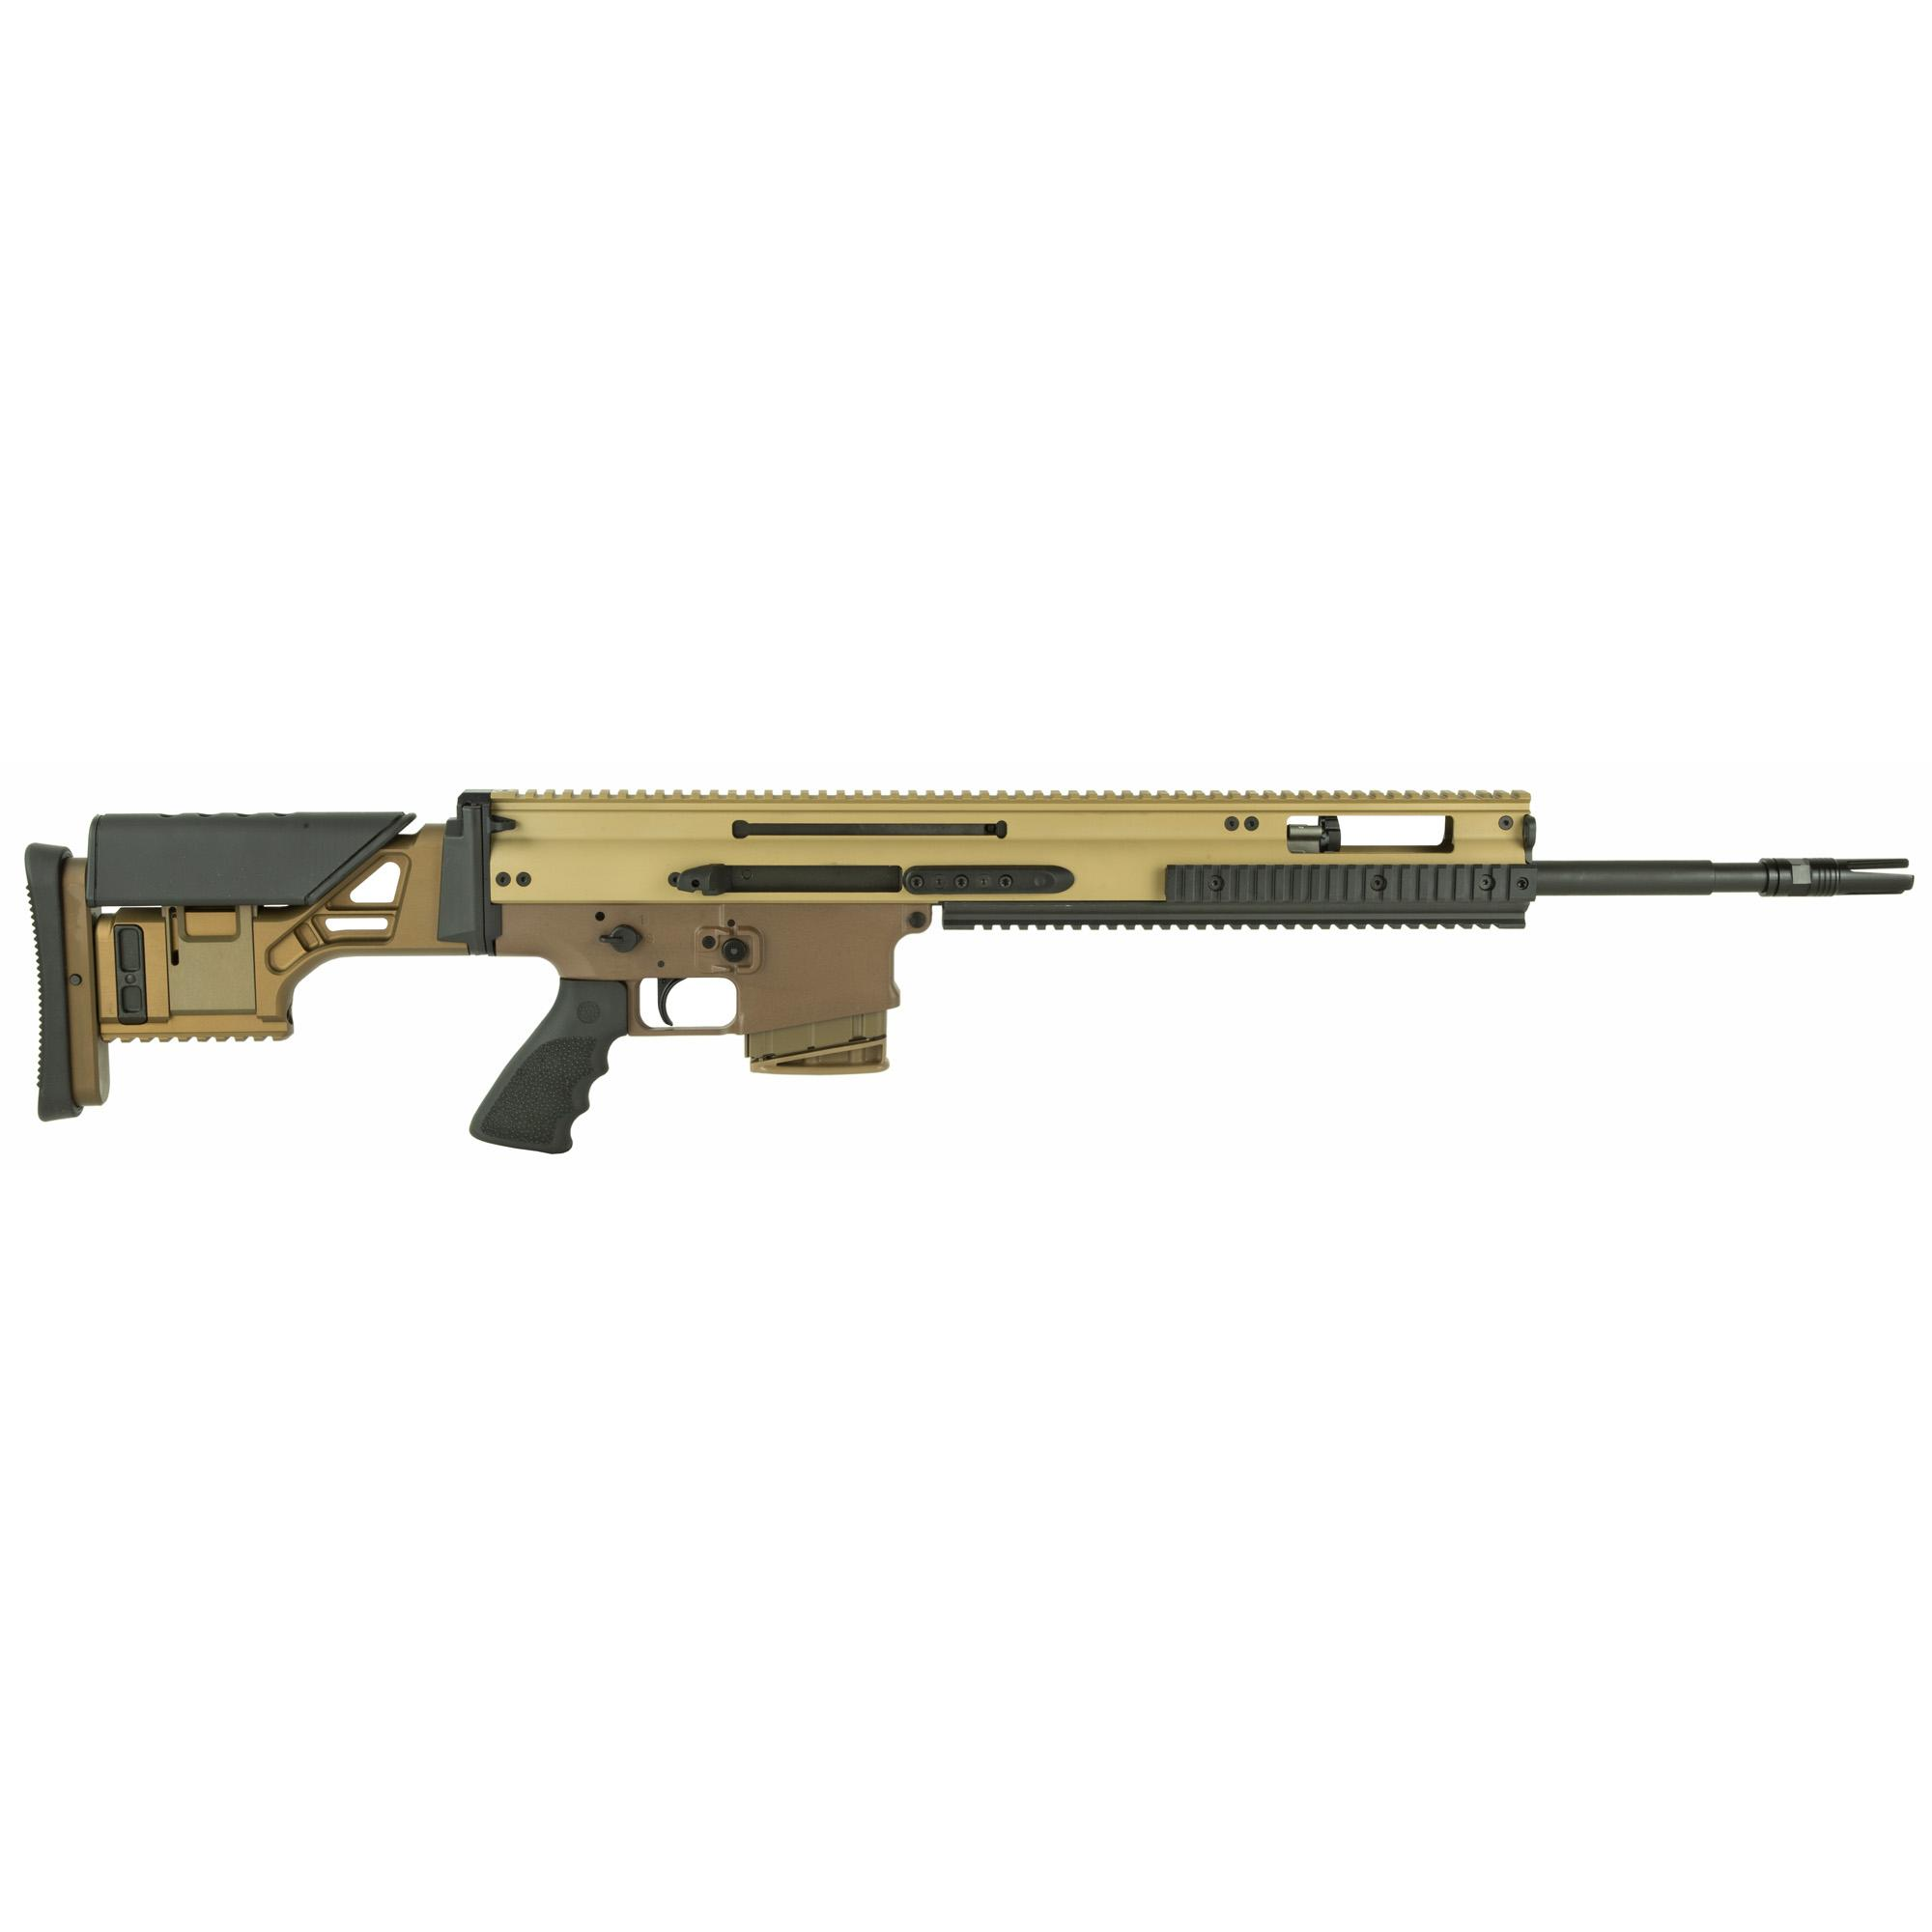 FN America Fn Scar 20s 308win 20